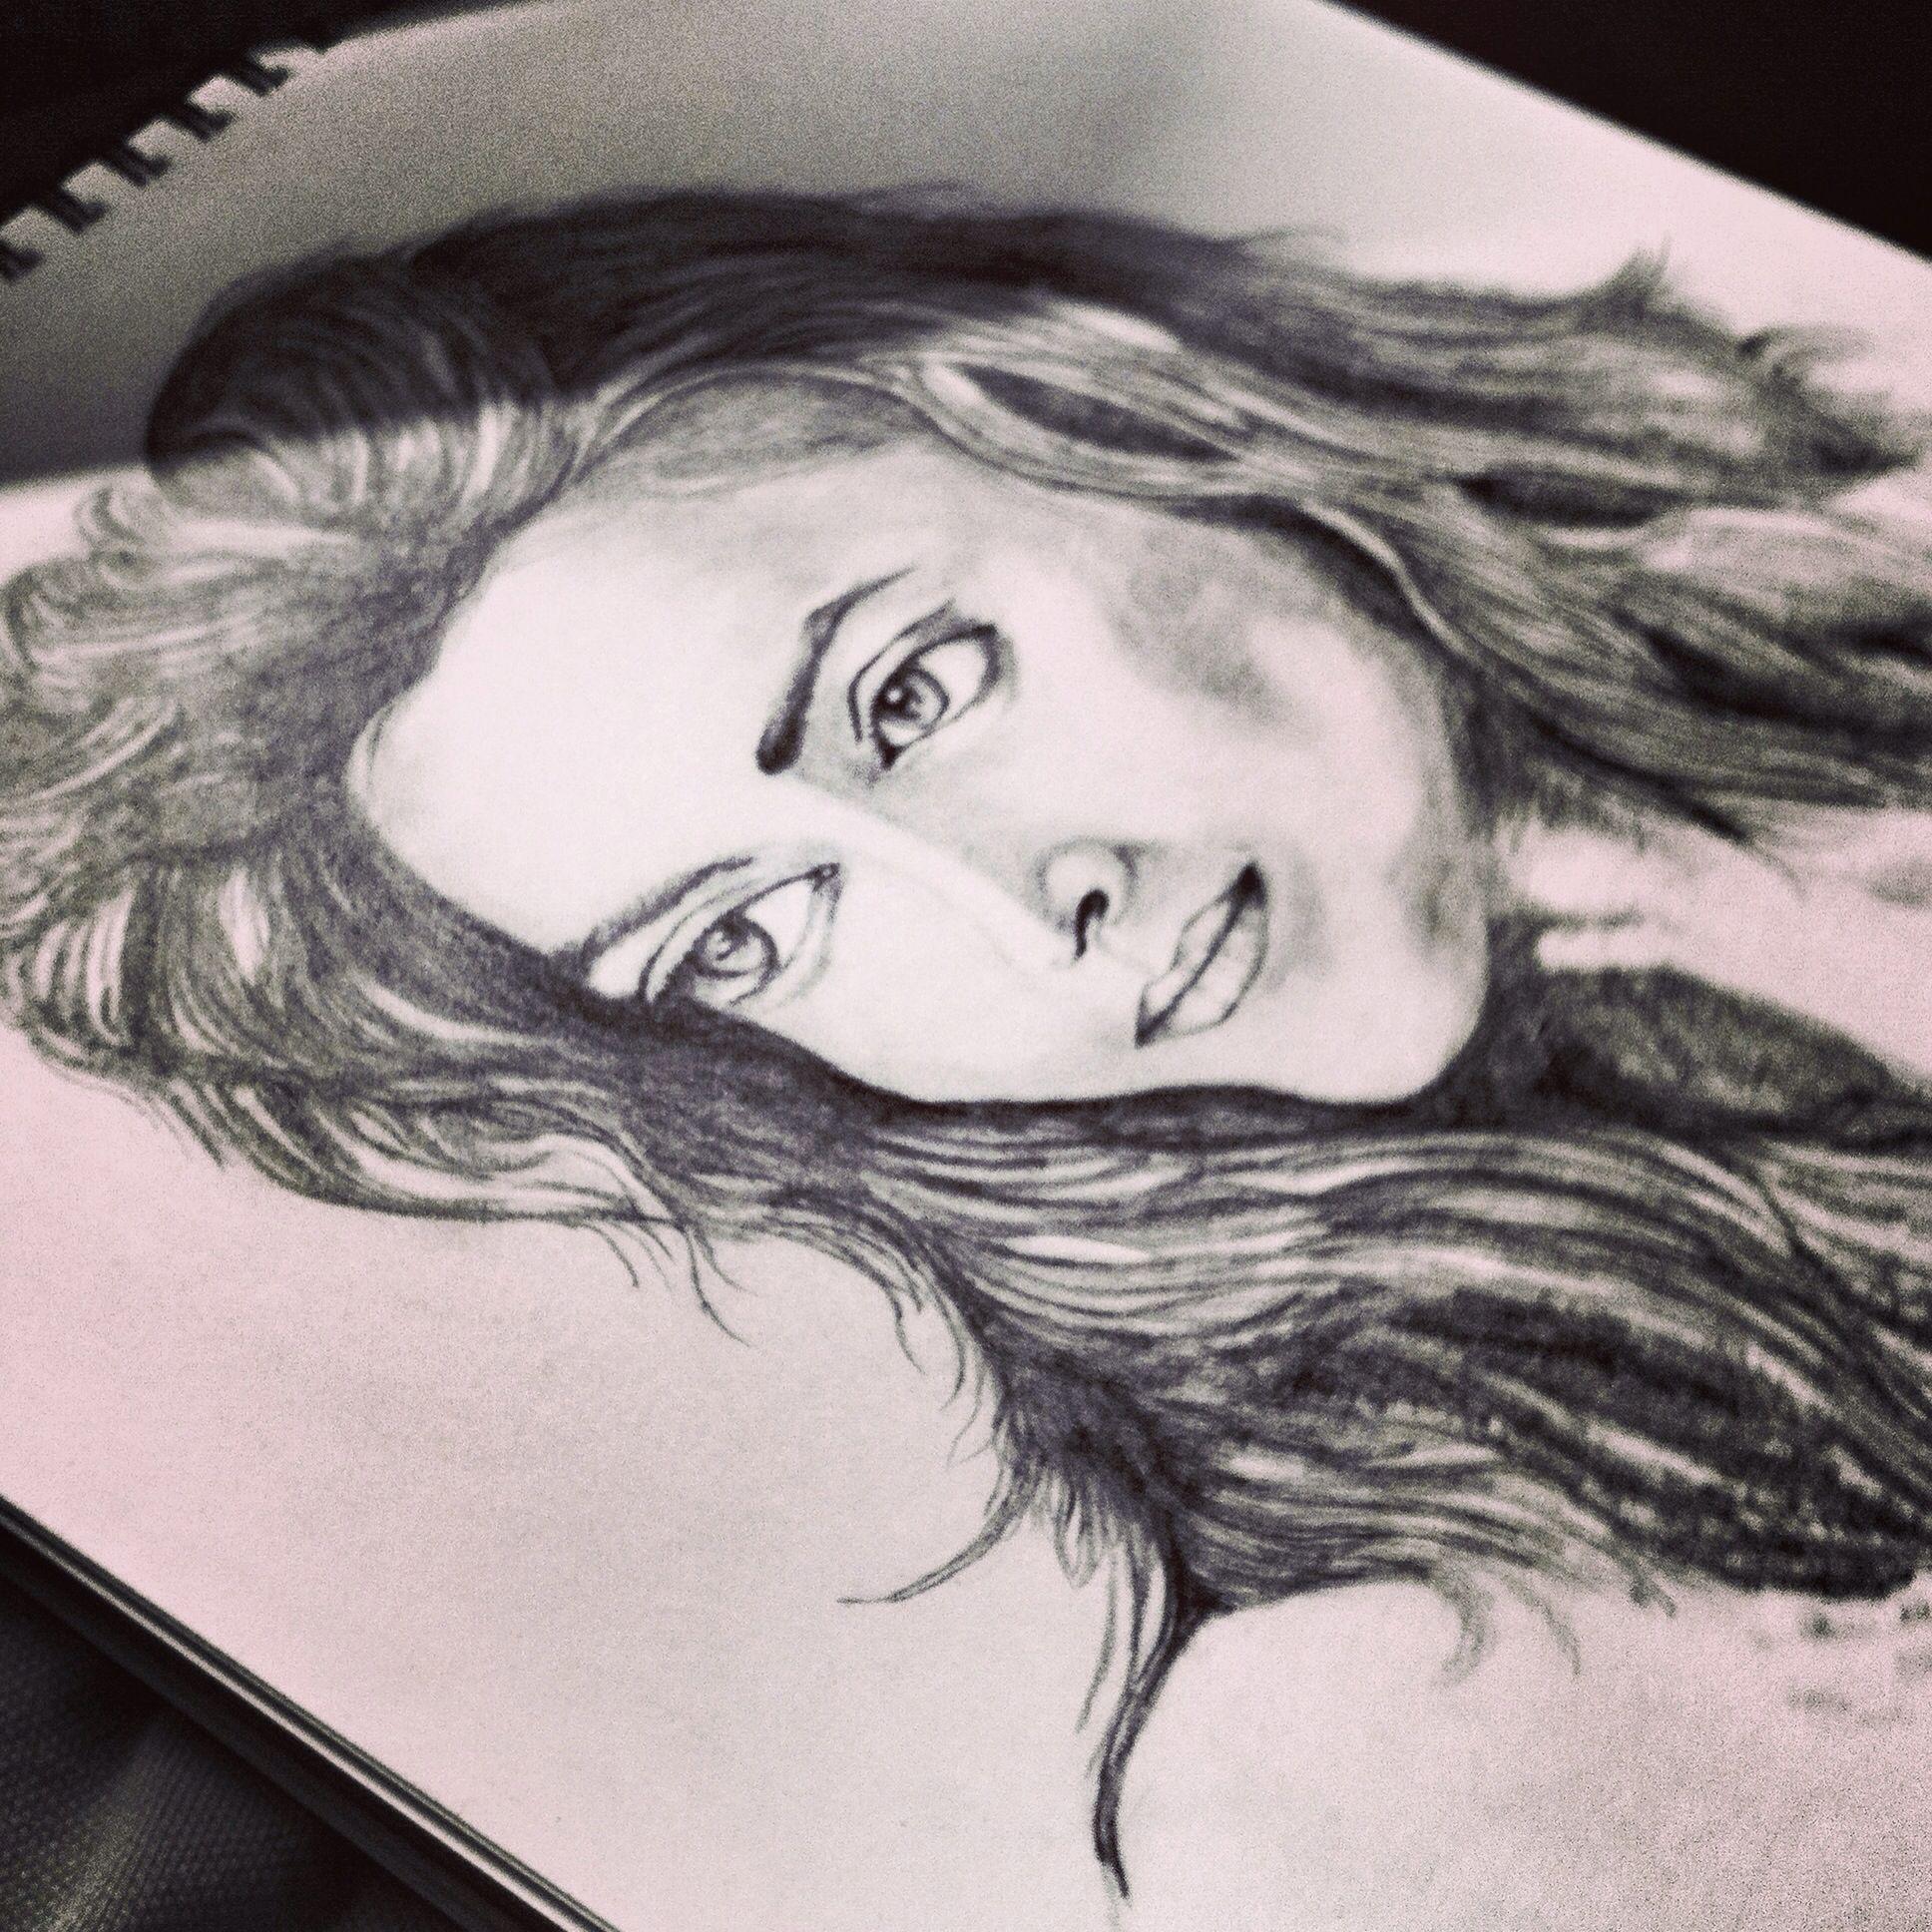 Deepika padukone sketch | Sketches, Art, Female sketch